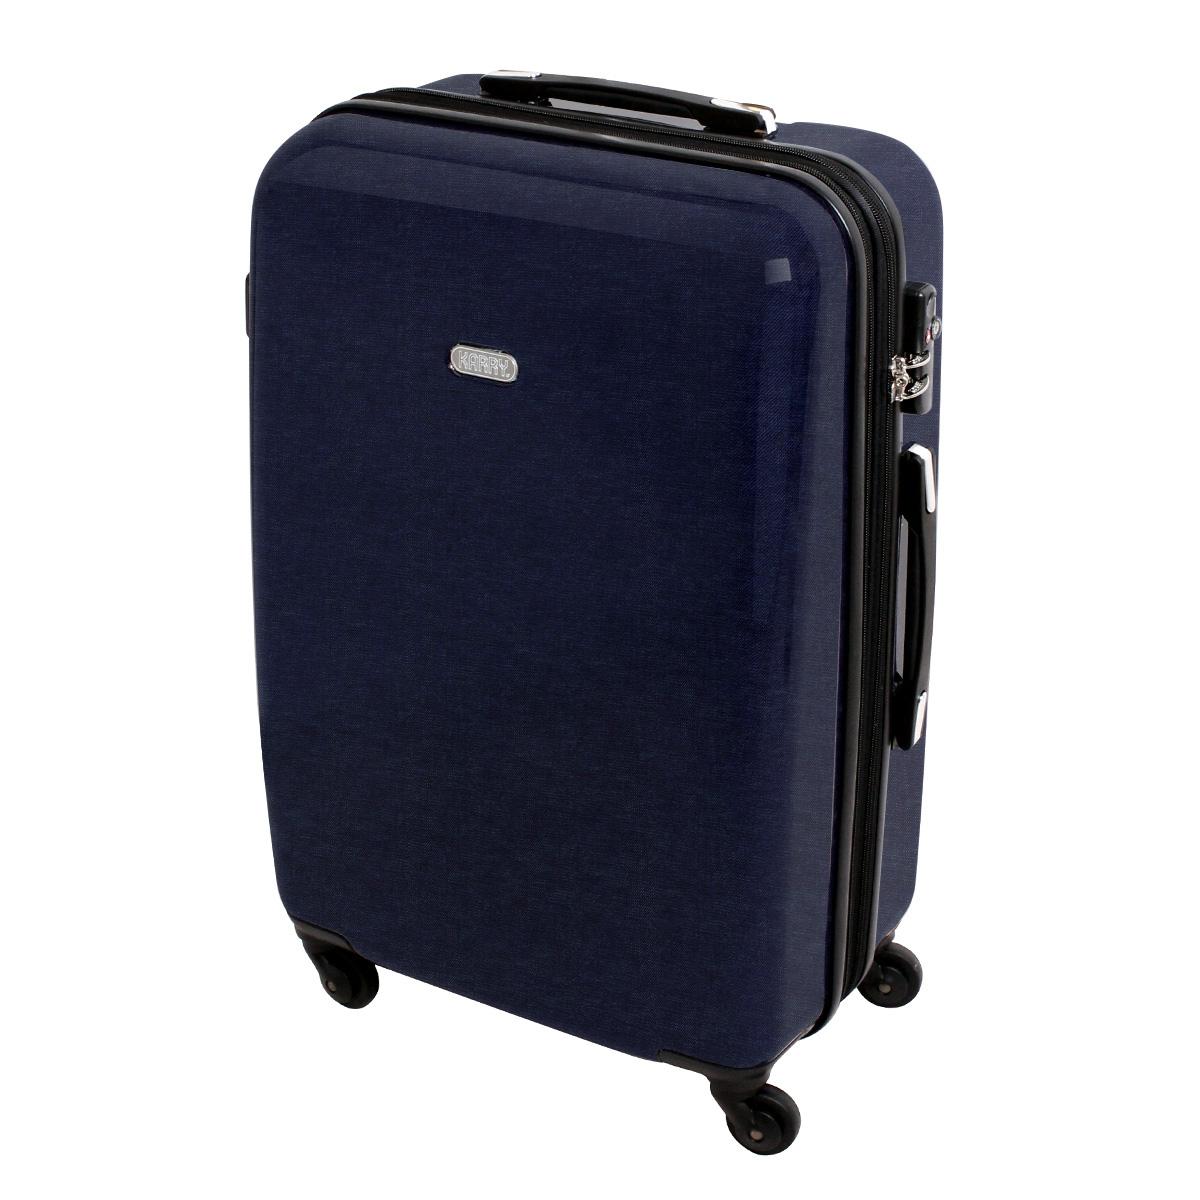 xl hartschalen reise koffer trolley tsa 80 liter jeans. Black Bedroom Furniture Sets. Home Design Ideas